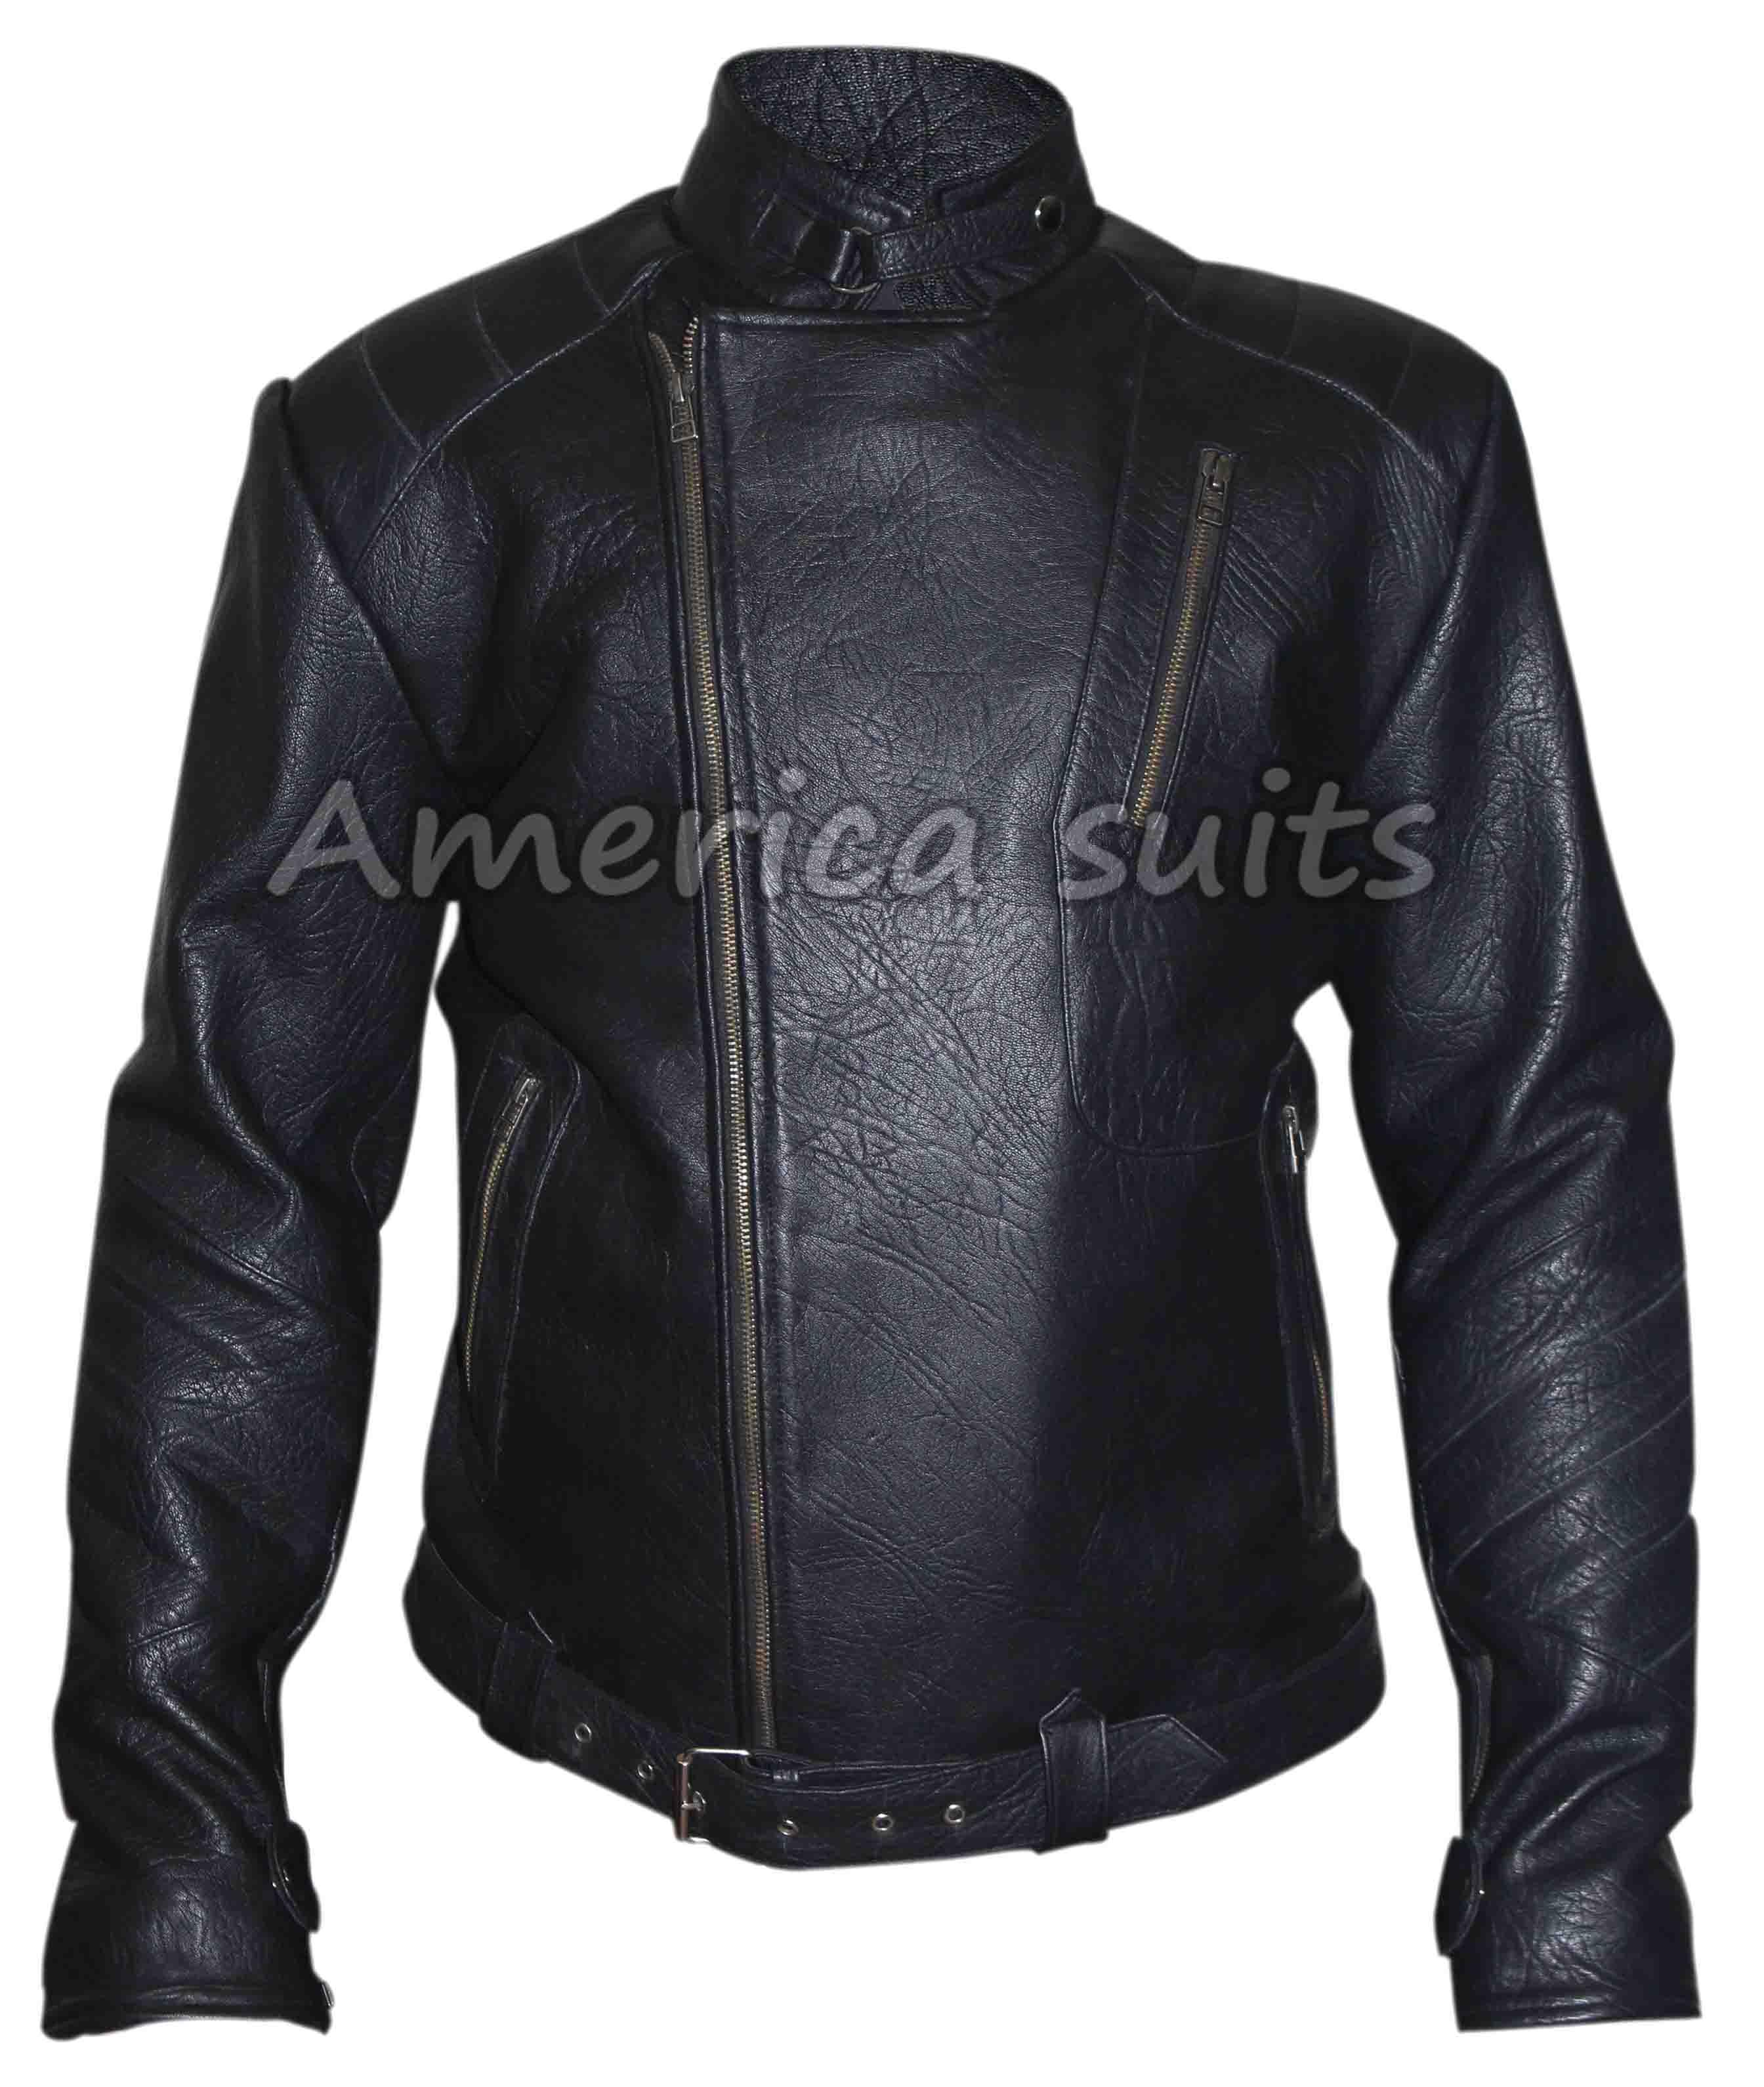 david-beckham-black-leather-jacket.JPG